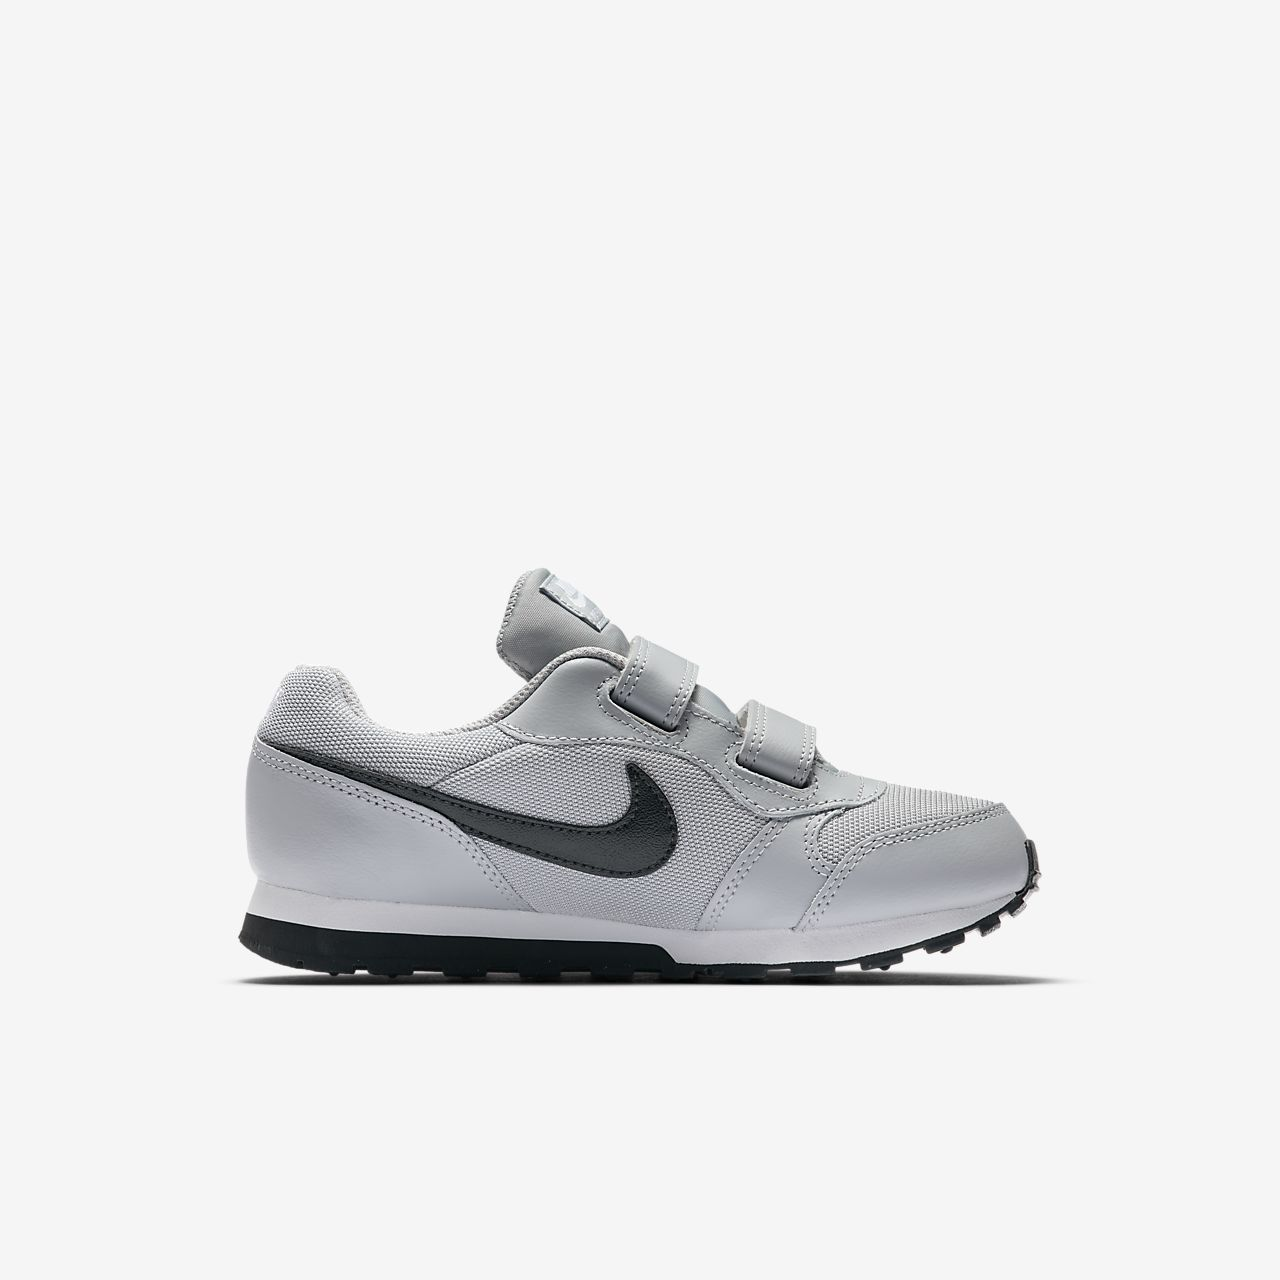 62b9c1d3f2aac1 Nike MD Runner 2 Younger Kids  Shoe. Nike.com MY